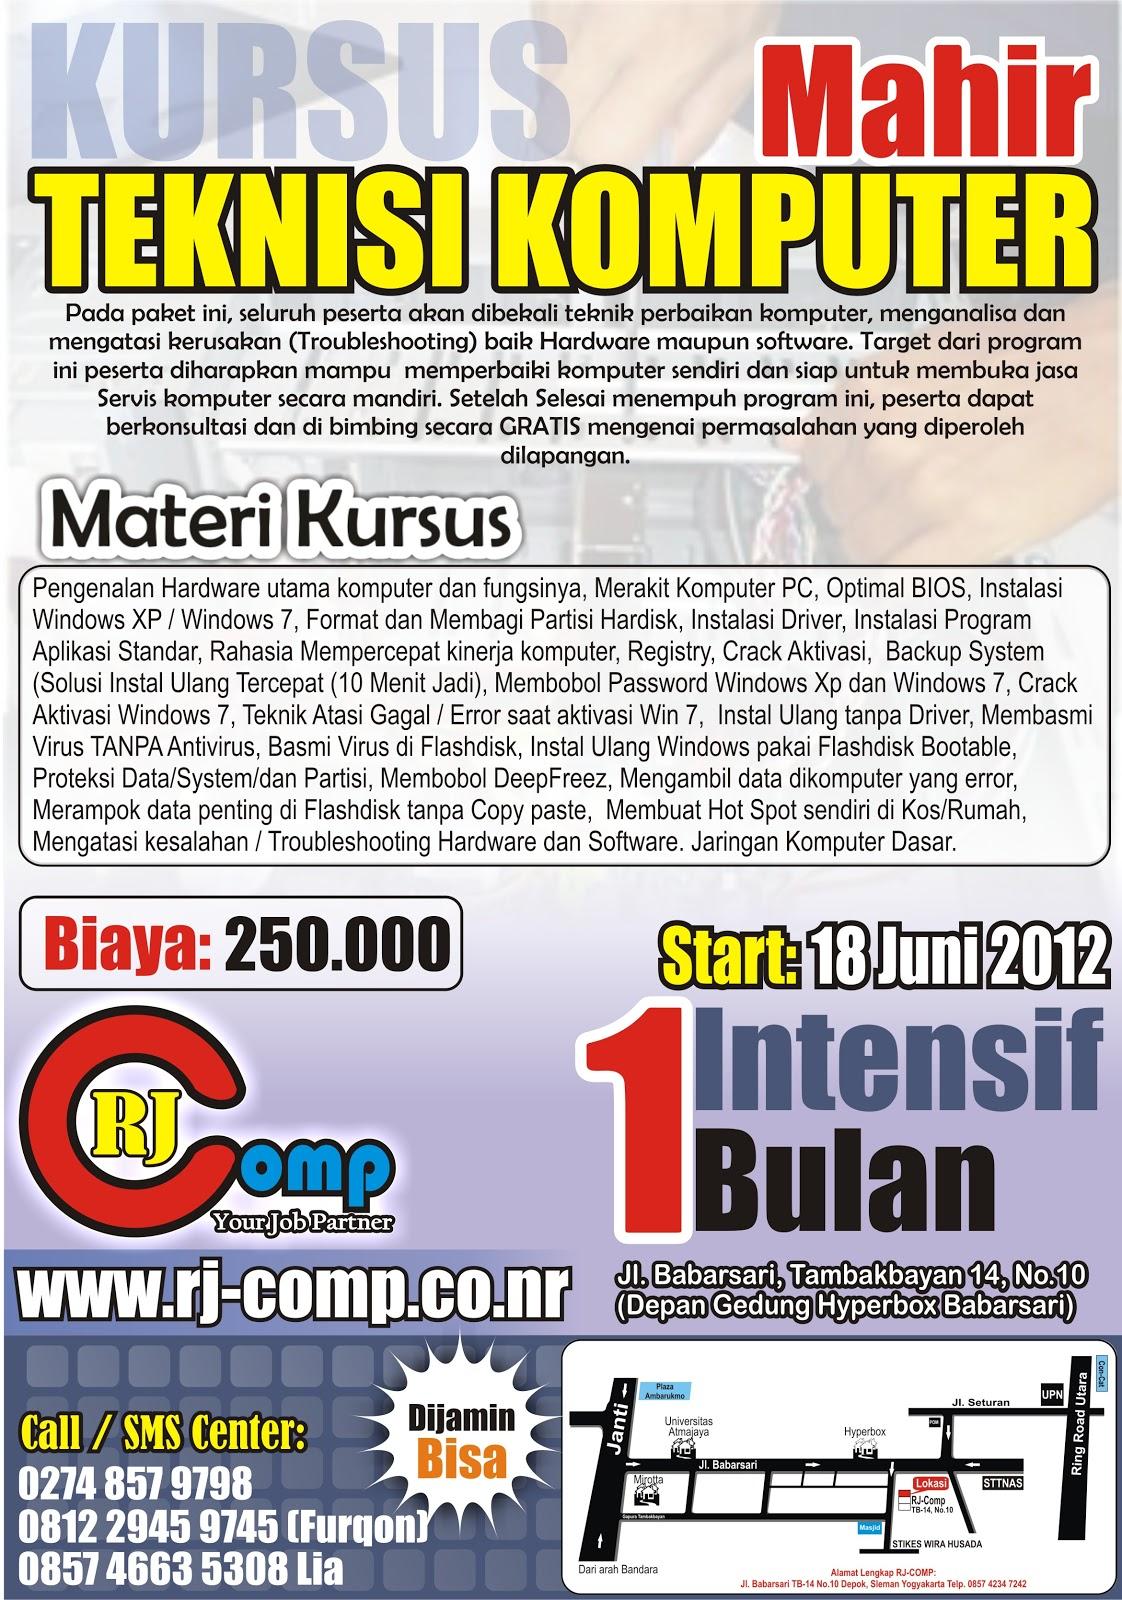 Privat Komputer di Yogyakarta | Kursus Komputer di Jogja ...